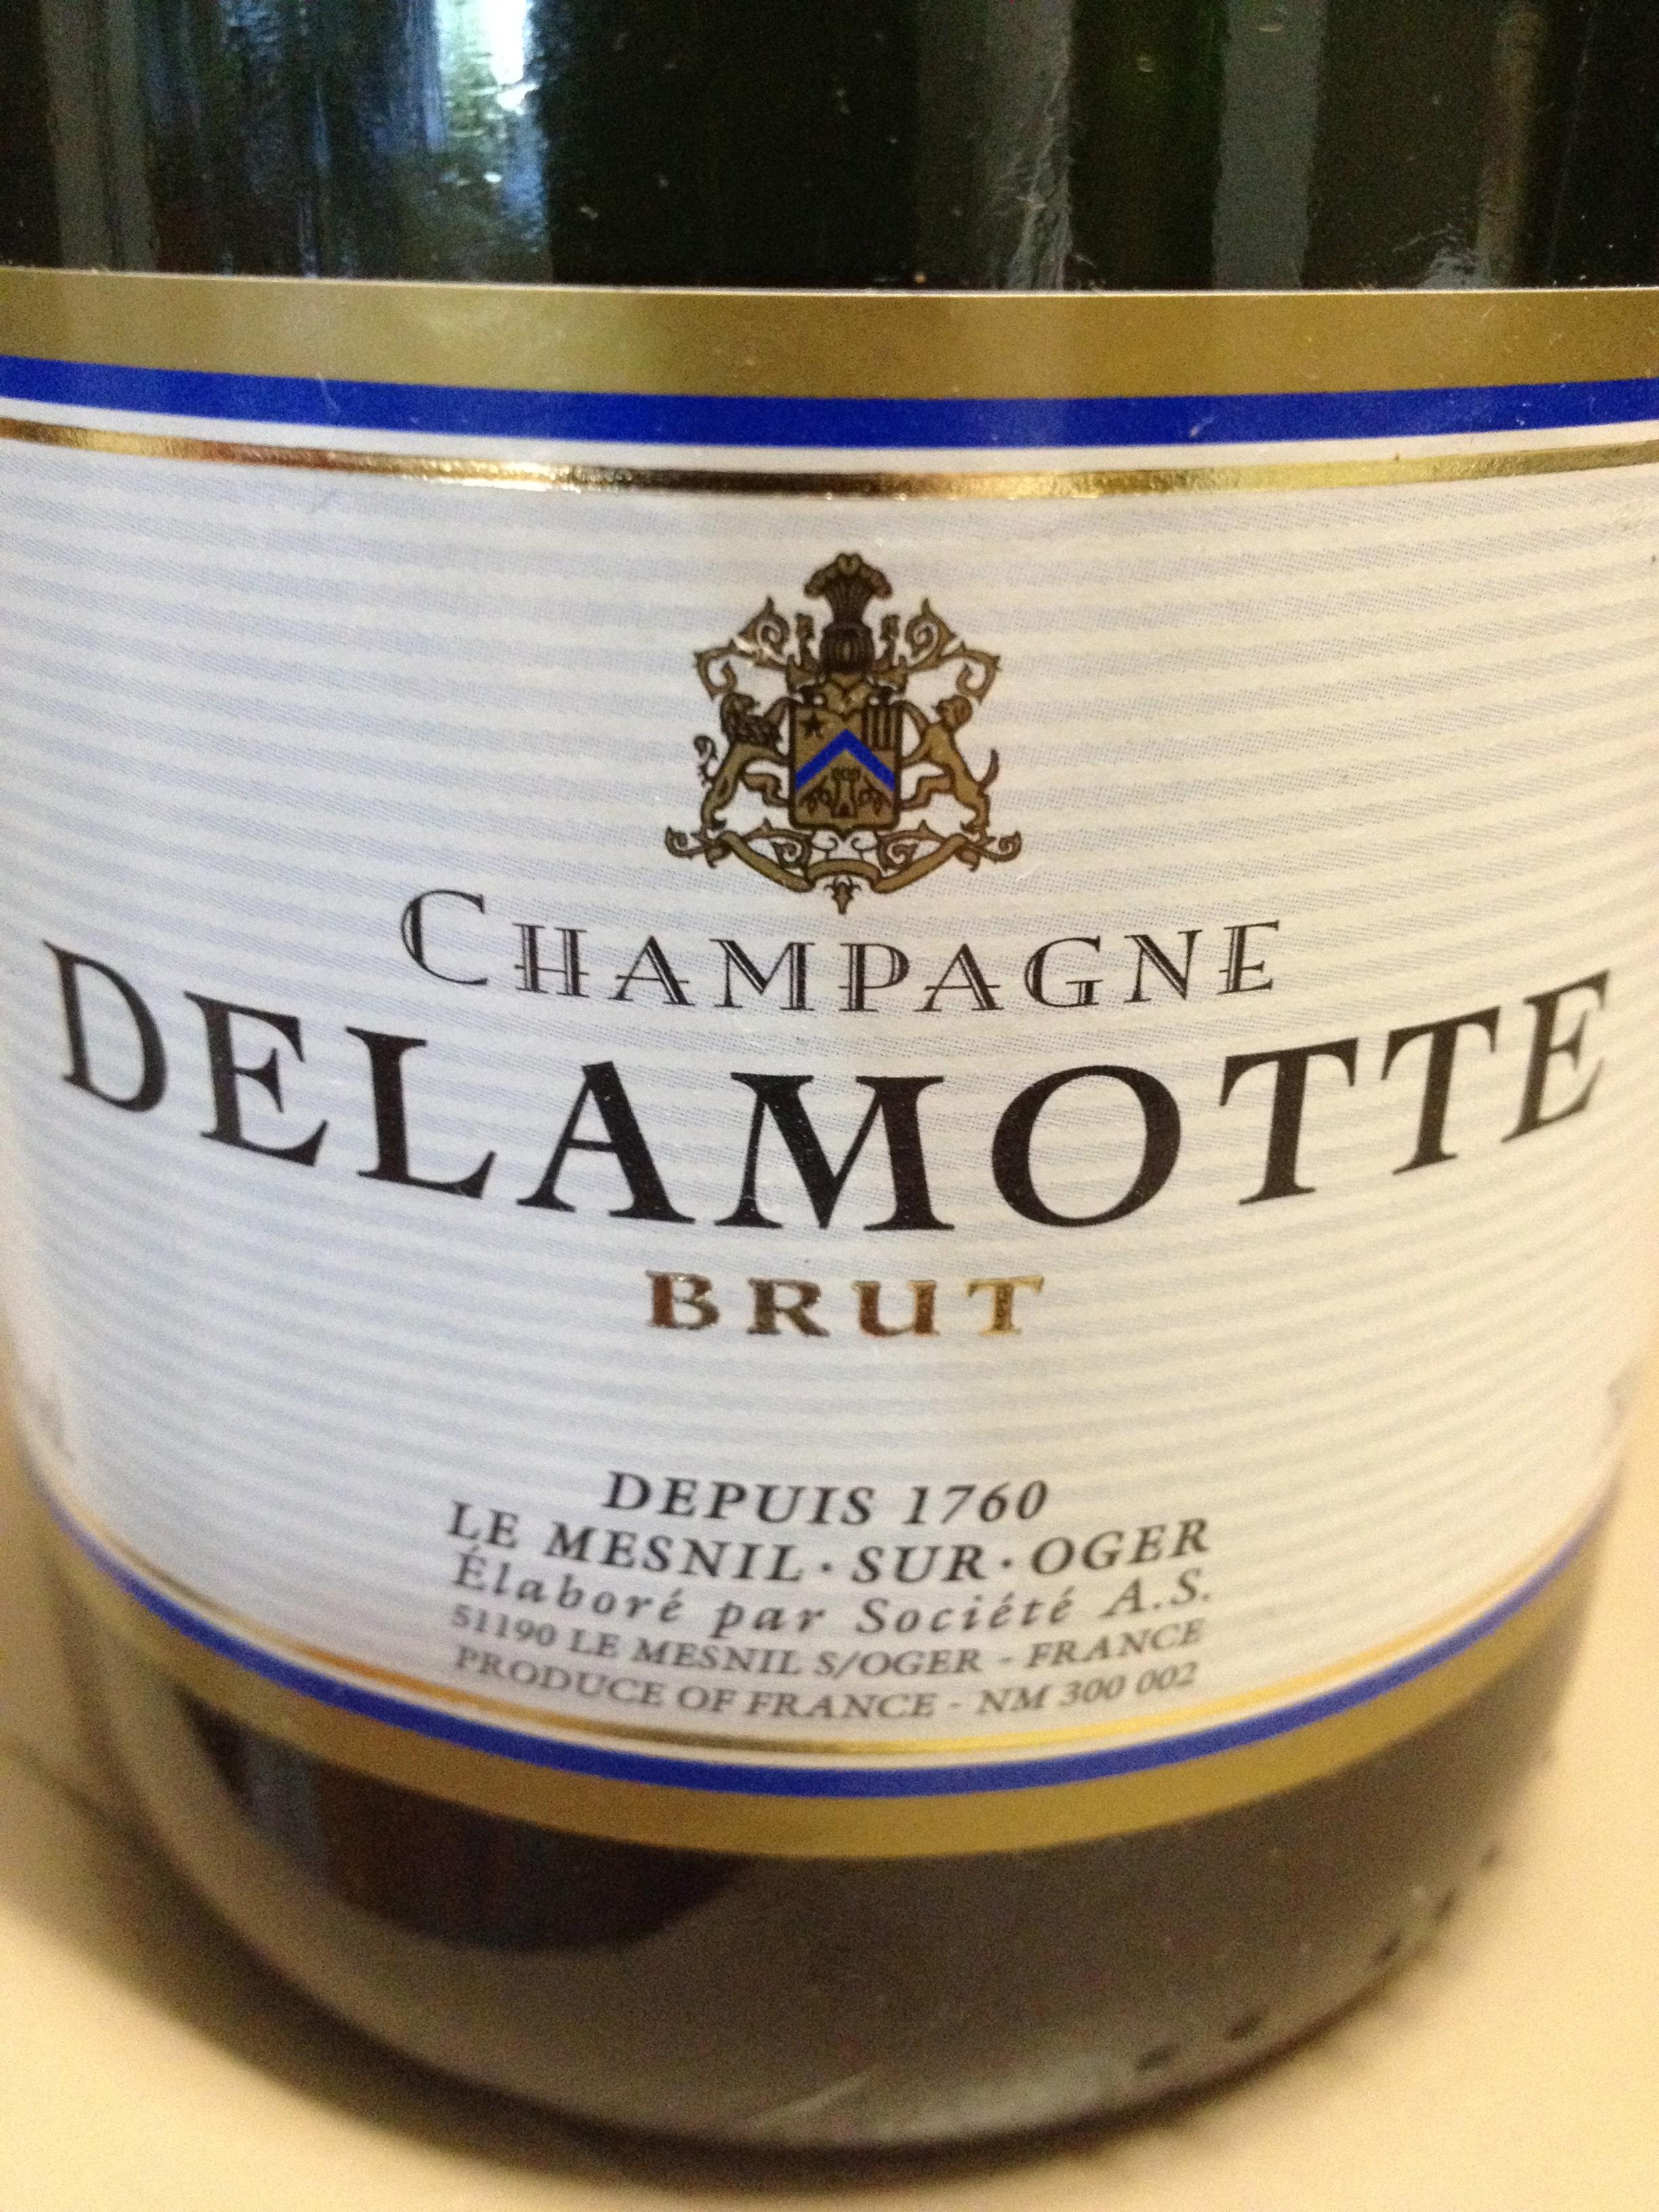 Sparkling wine charles scicolone on wine for Champagne delamotte brut prix